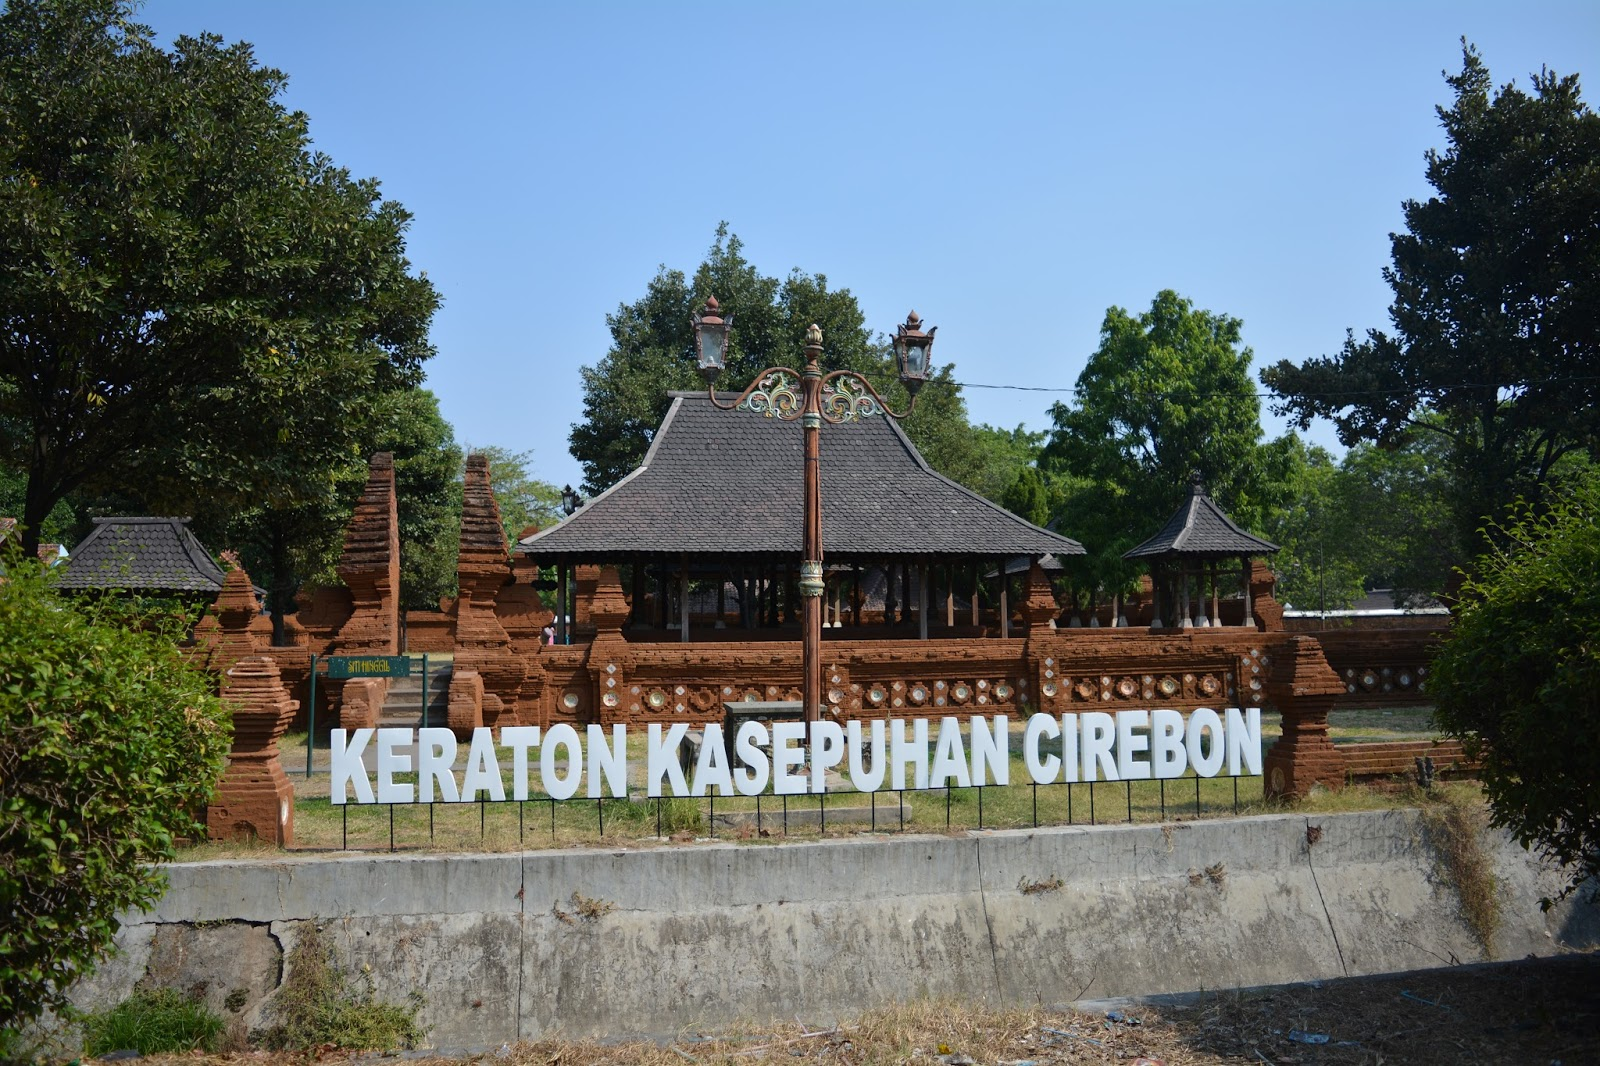 Keraton-Kasepuhan-Cirebon